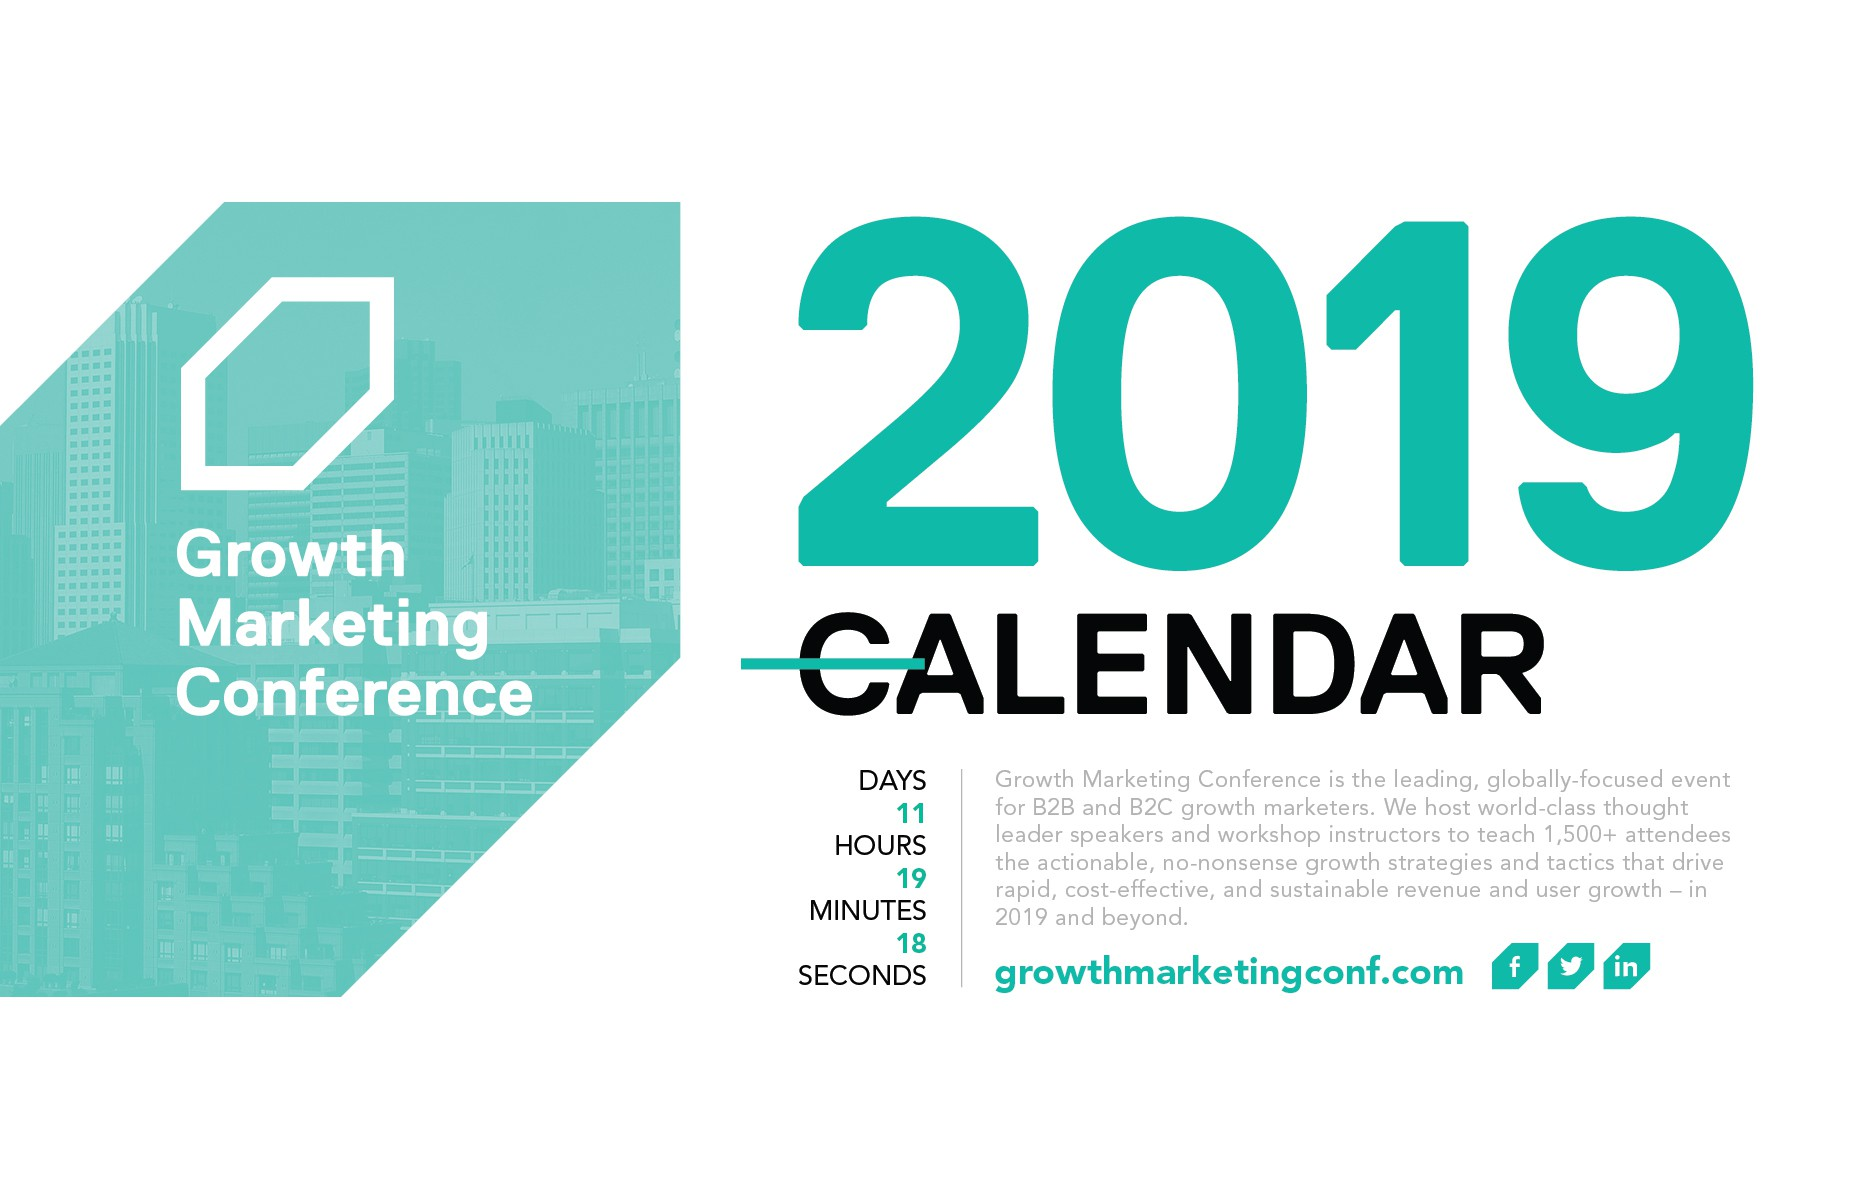 Growth Marketing Conference Custom Event Calendar